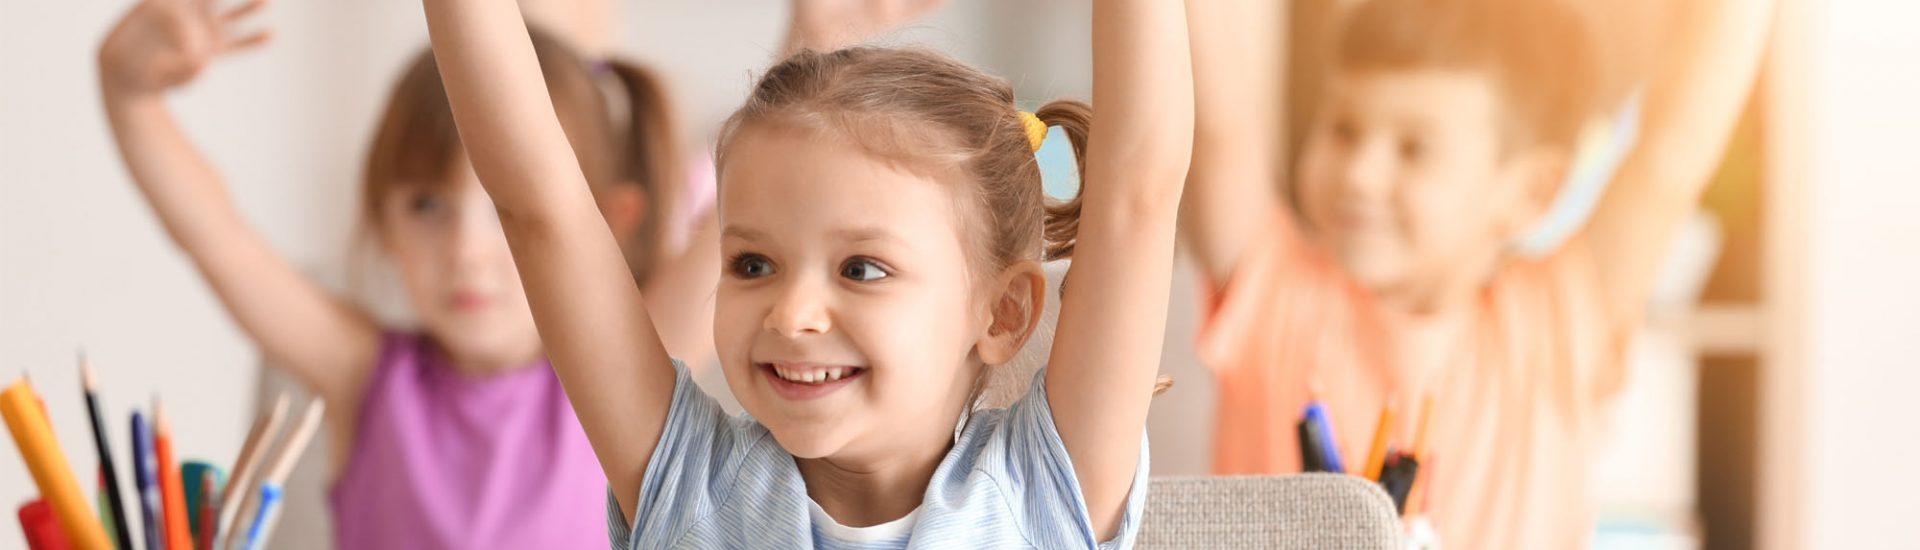 Jaybest Kinder Smartwatch: Top 3 Modelle